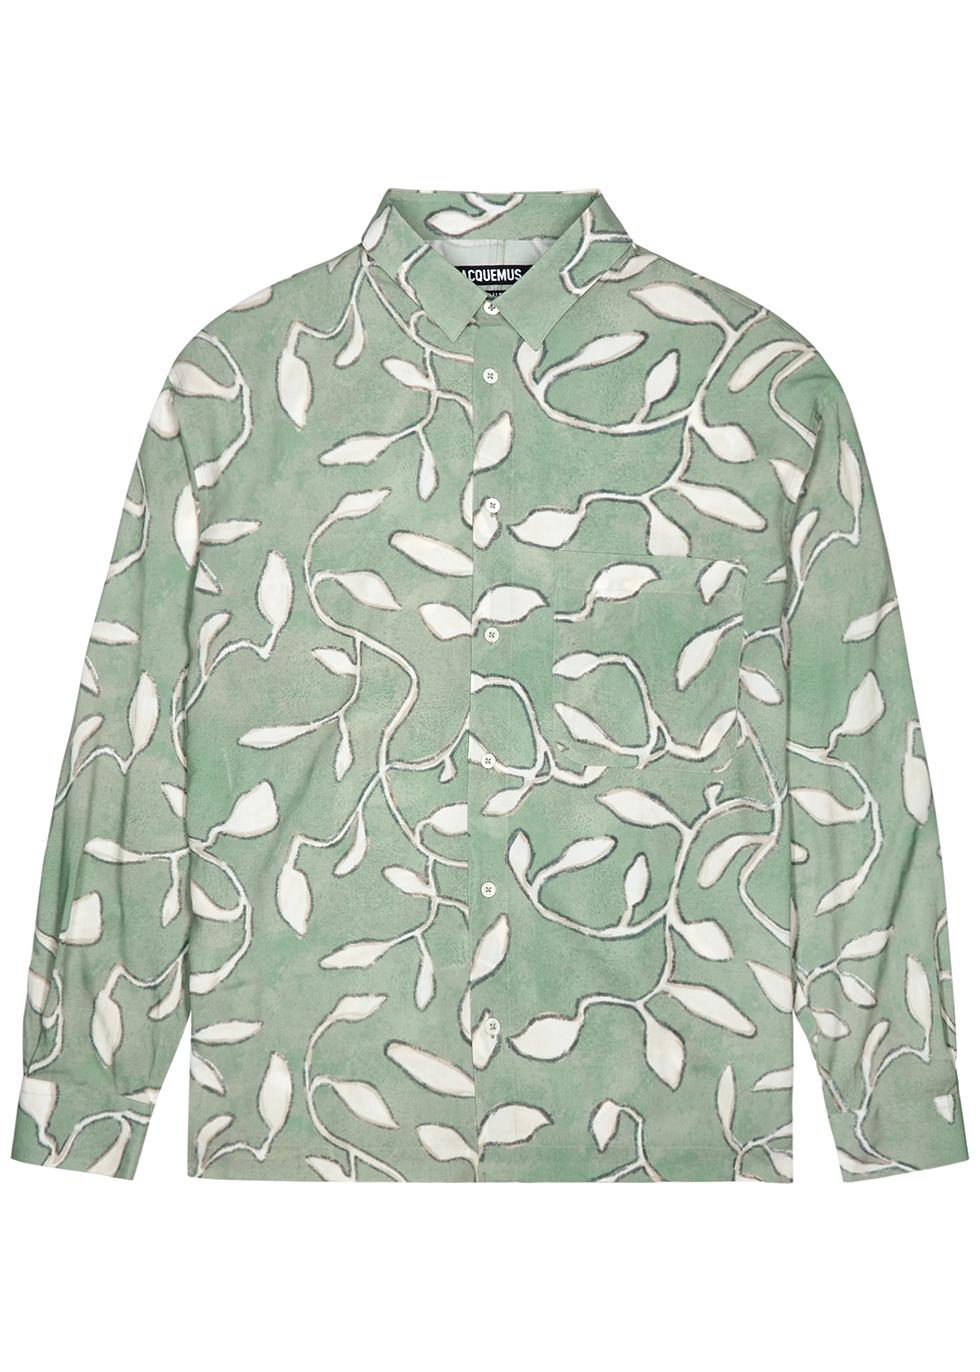 La Chemise Baou printed viscose shirt